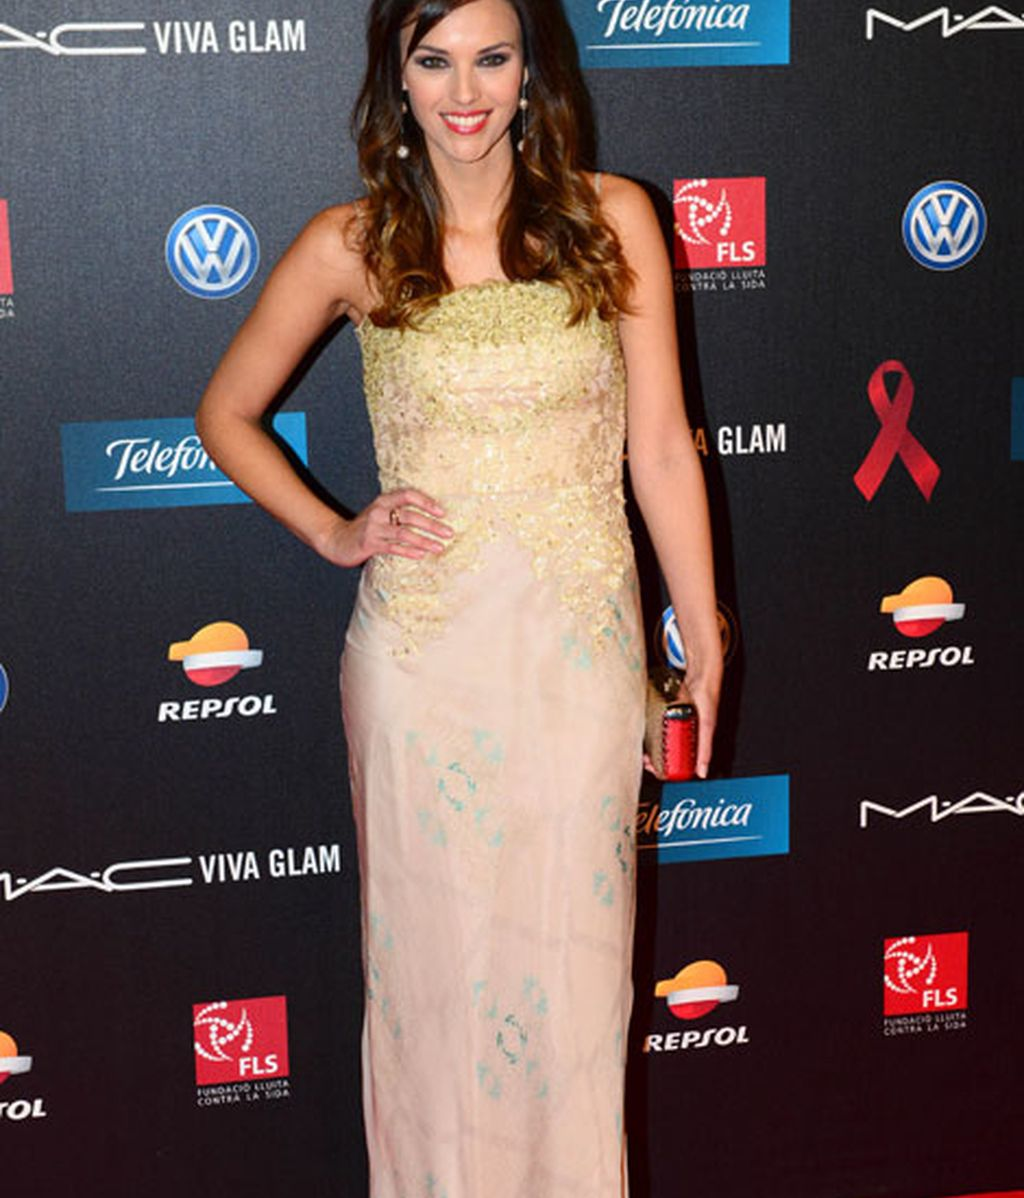 La modelo Helen Lindes, radiante